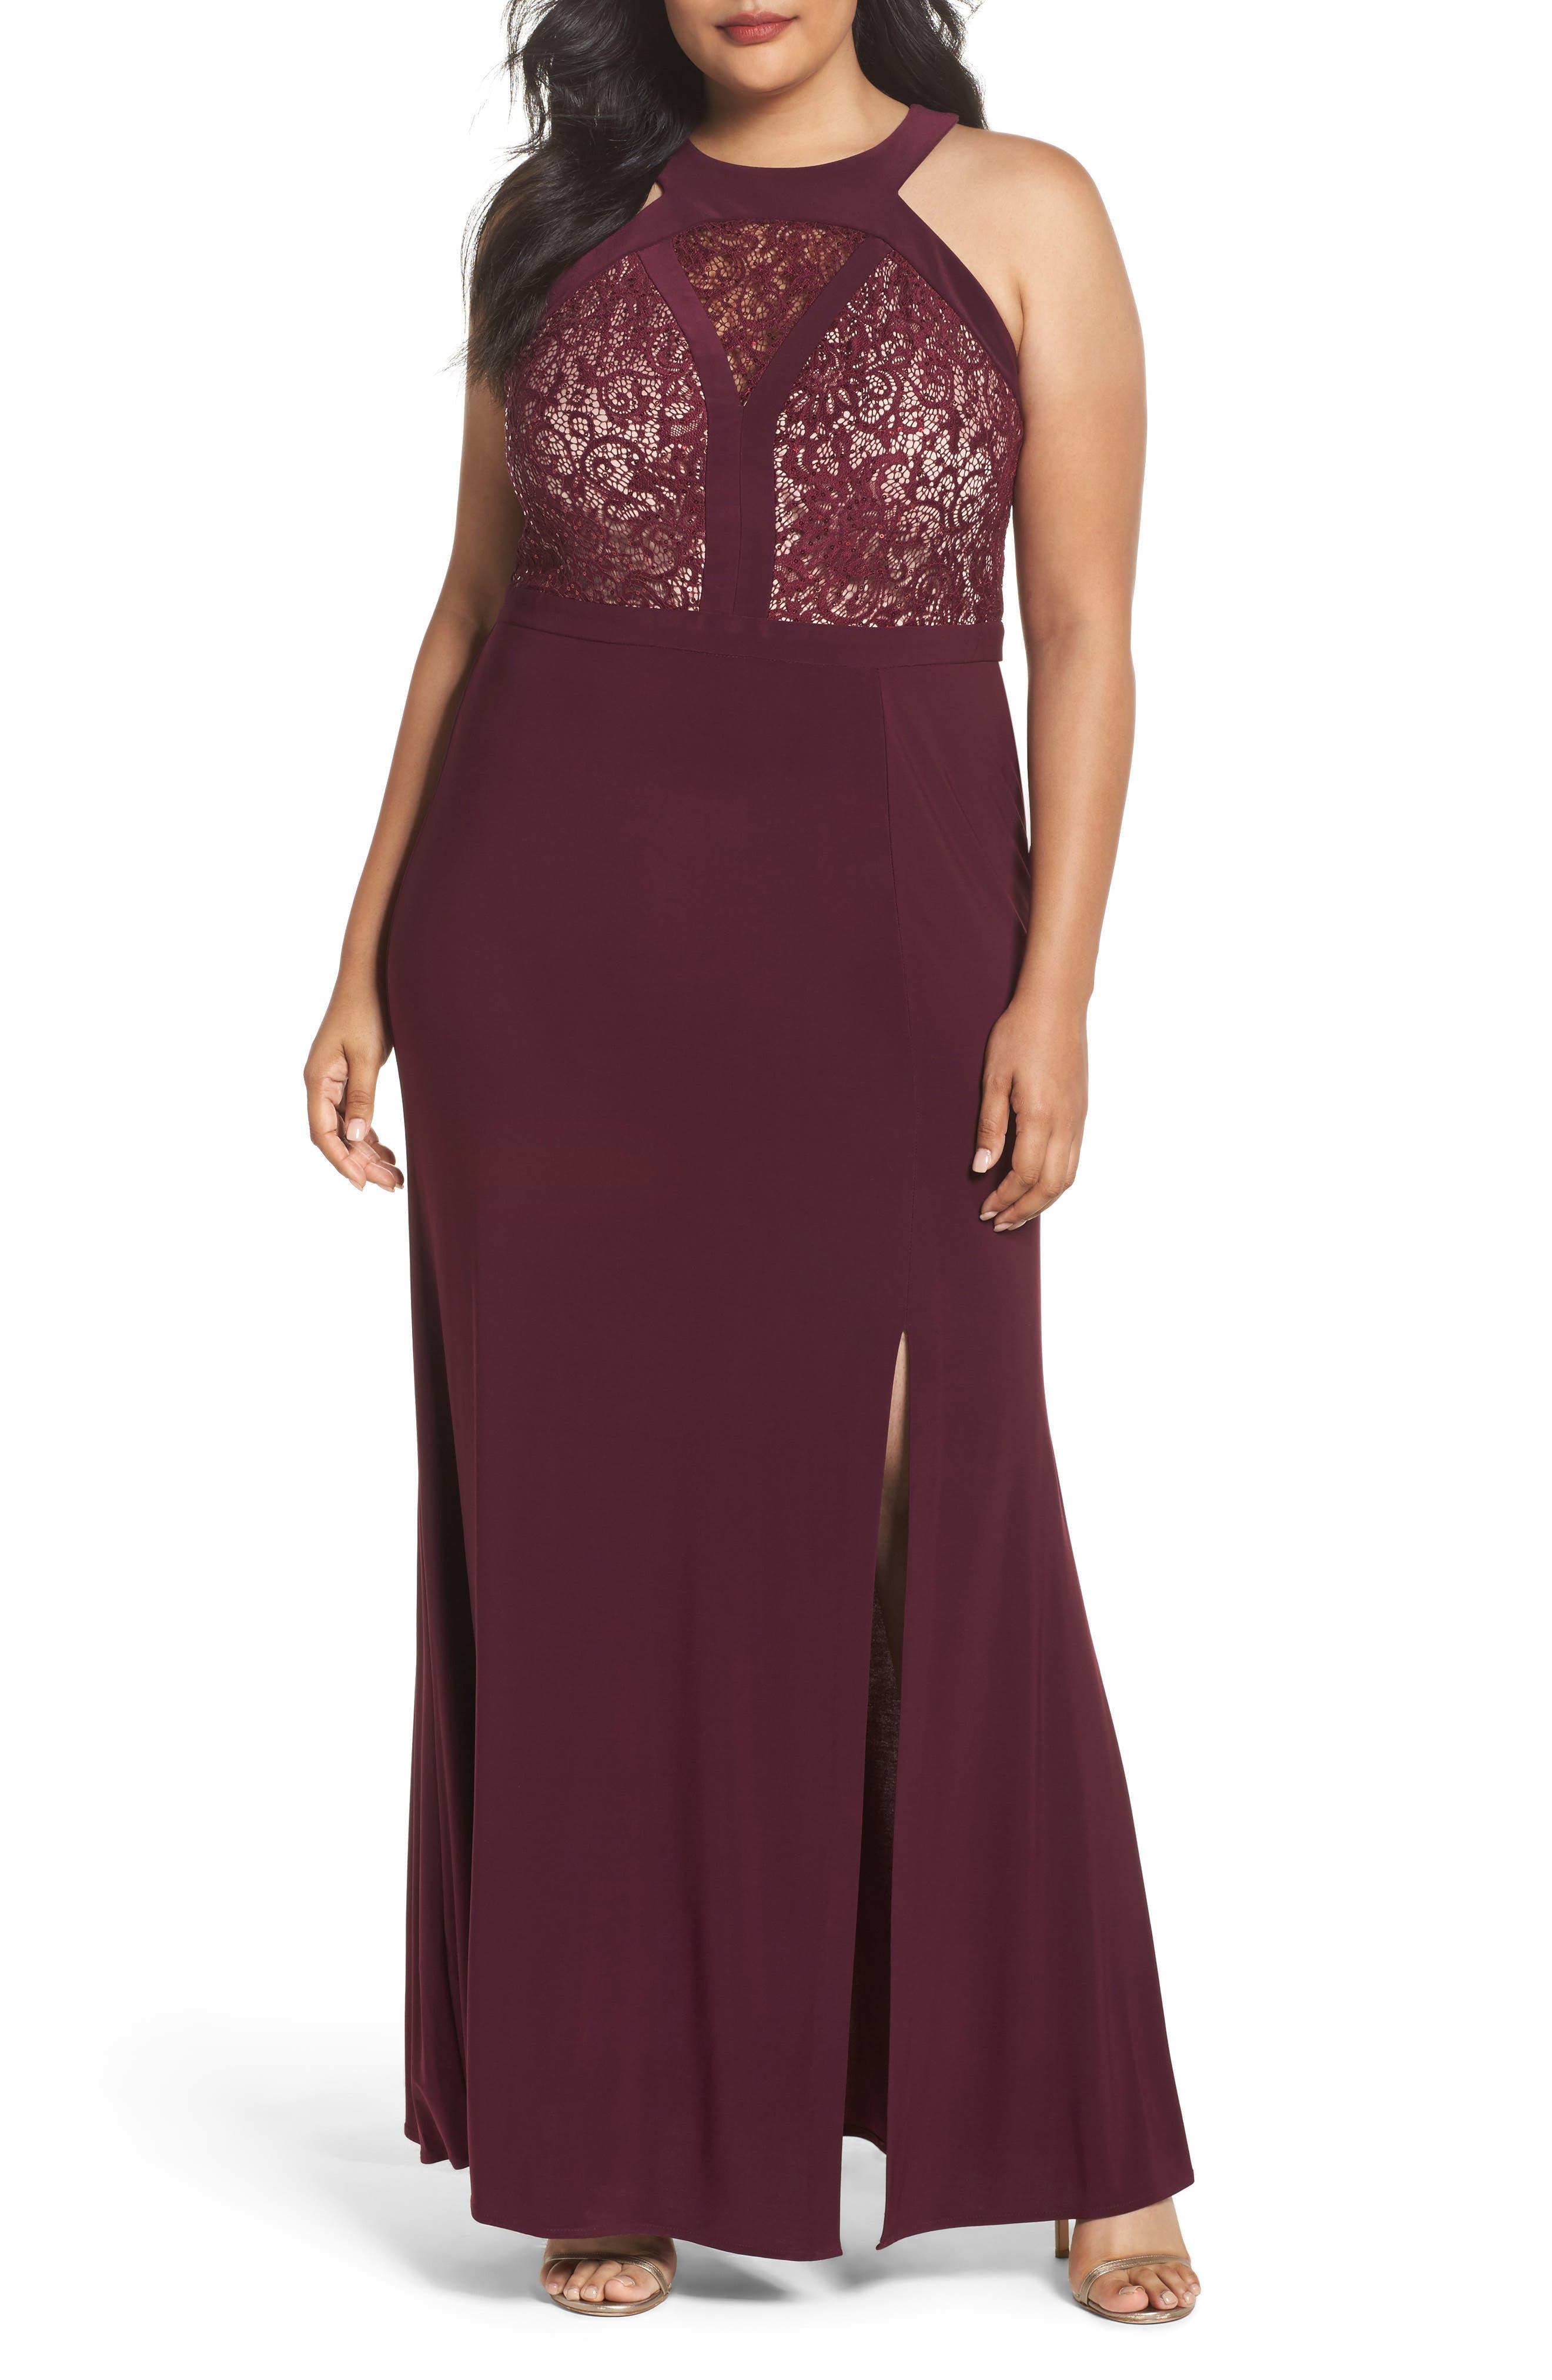 Morgan & Co. Lace Bodice Dress (Plus Size)